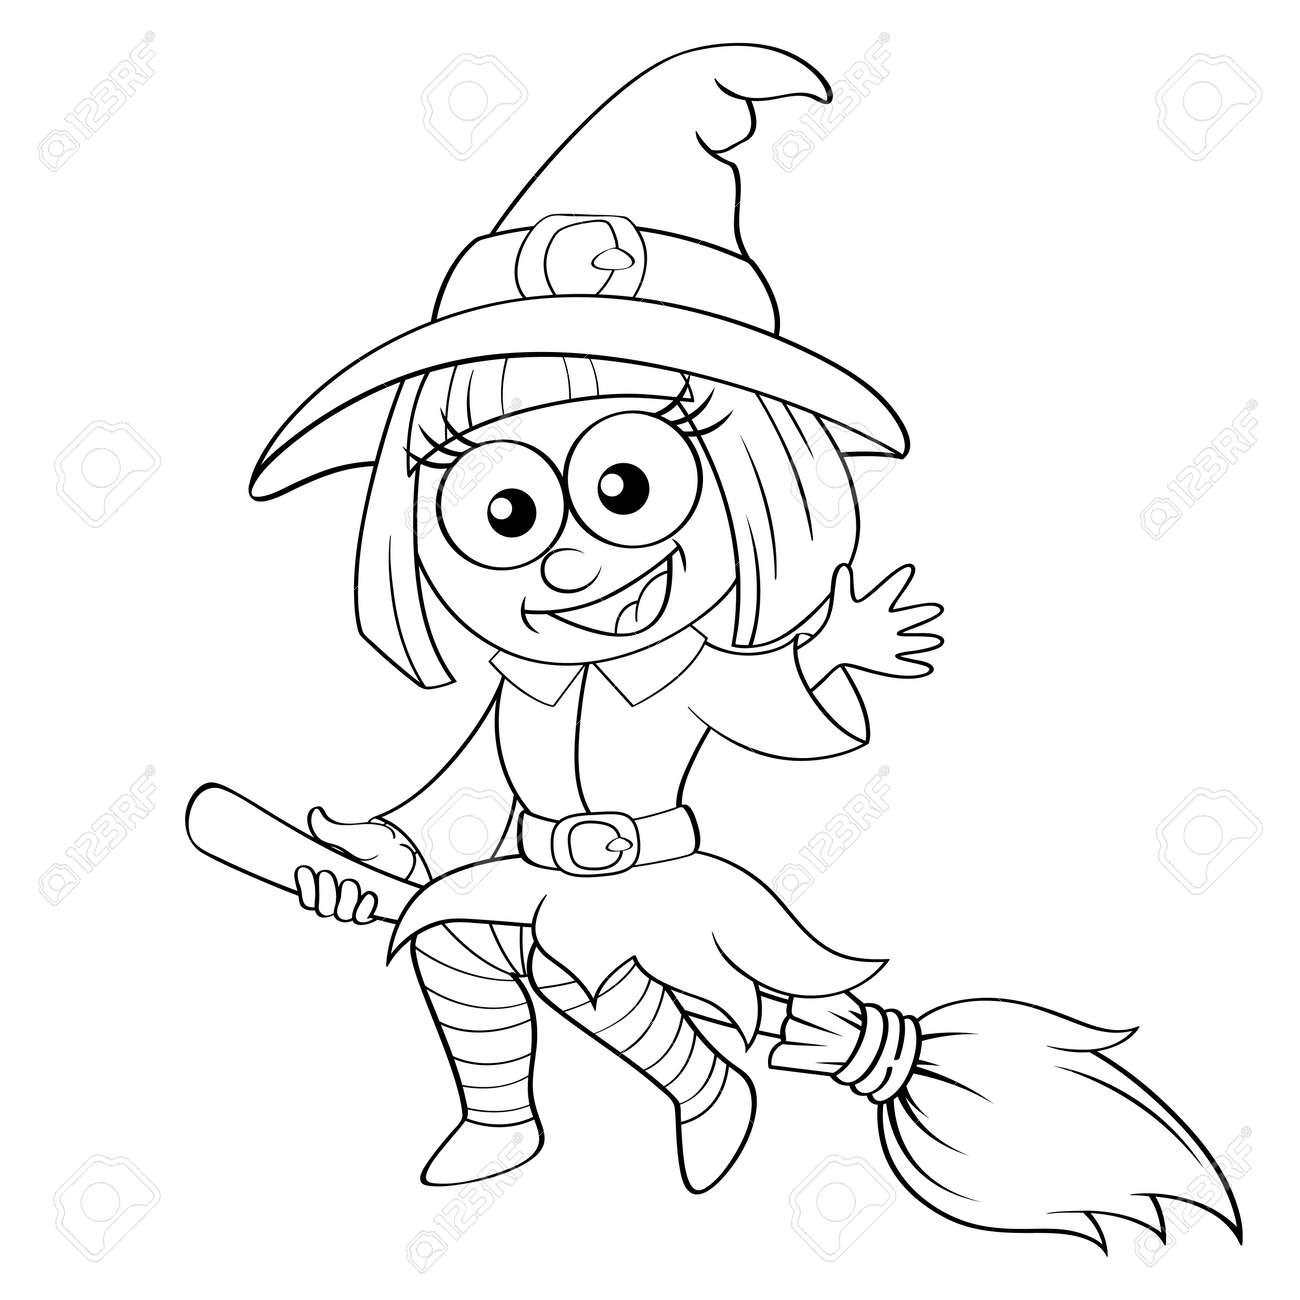 Nett Halloween Fliegen Hexe Malvorlagen Ideen - Druckbare ...